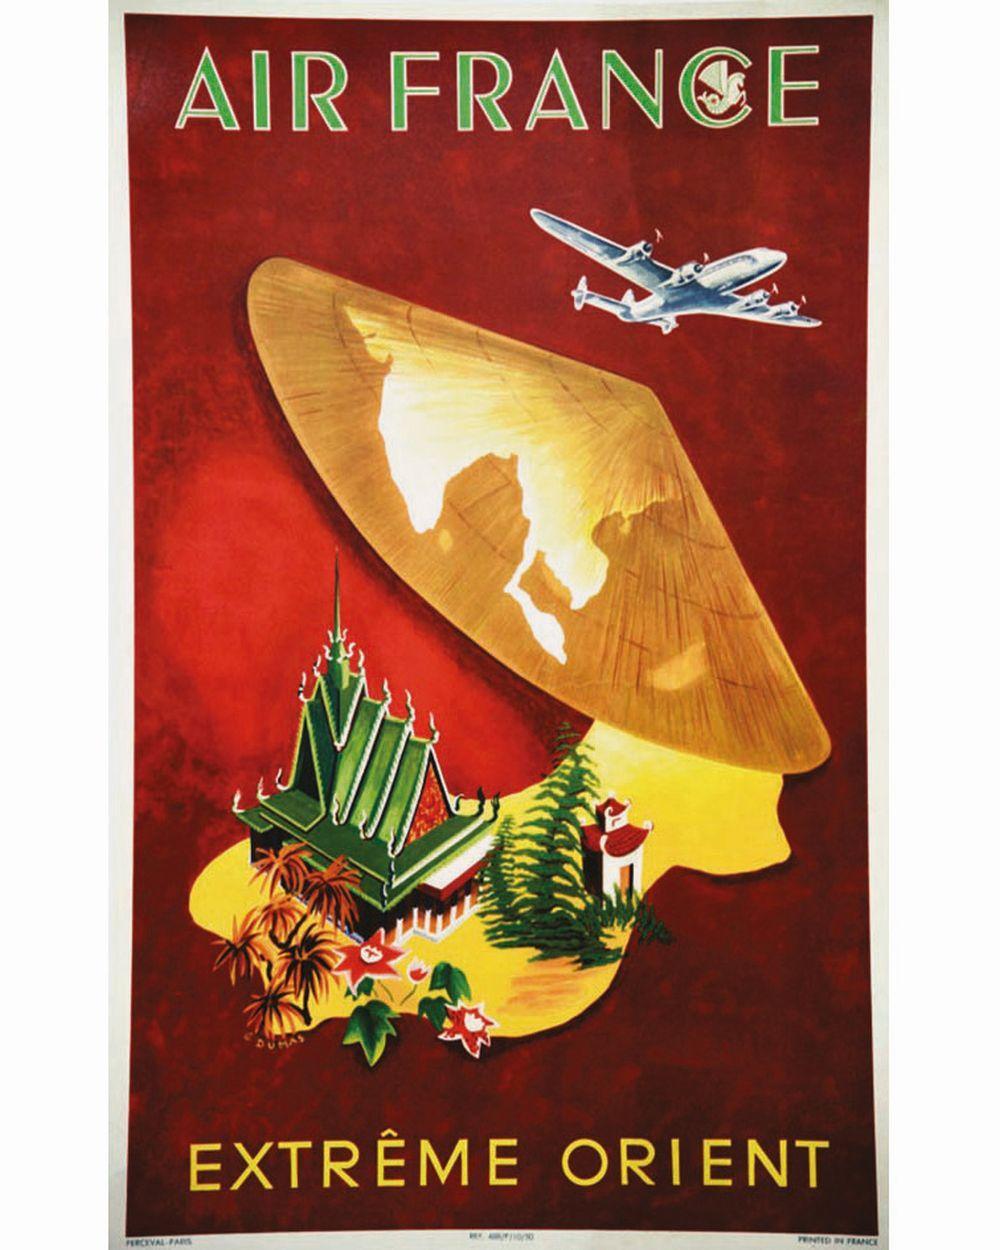 DUMAS G. - Air France Extrème Orient très rare     1950